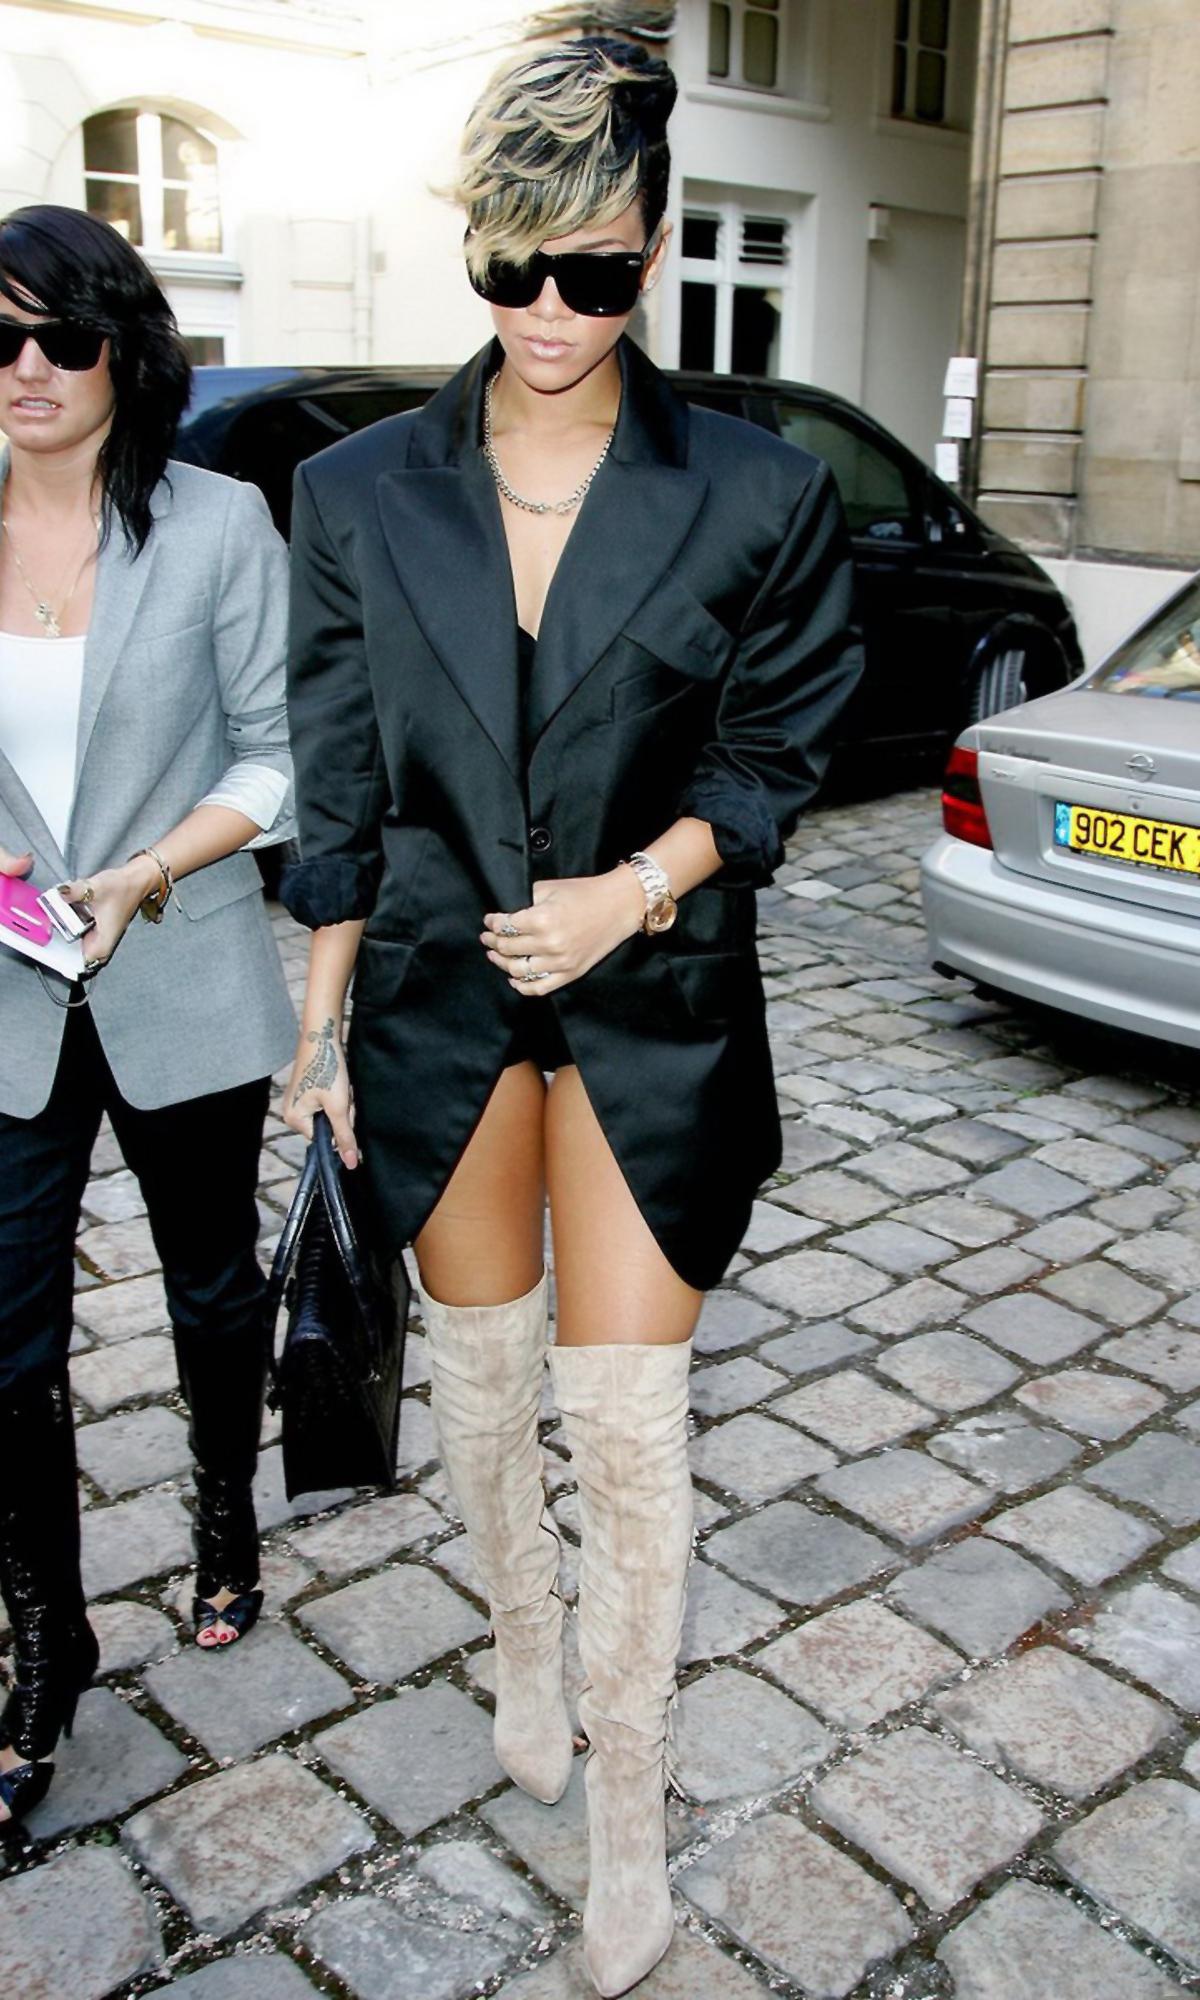 55368_Rihanna_Vivienne_Westwood_Show_Paris_Fashion_Week_021009_003_122_34lo.jpg